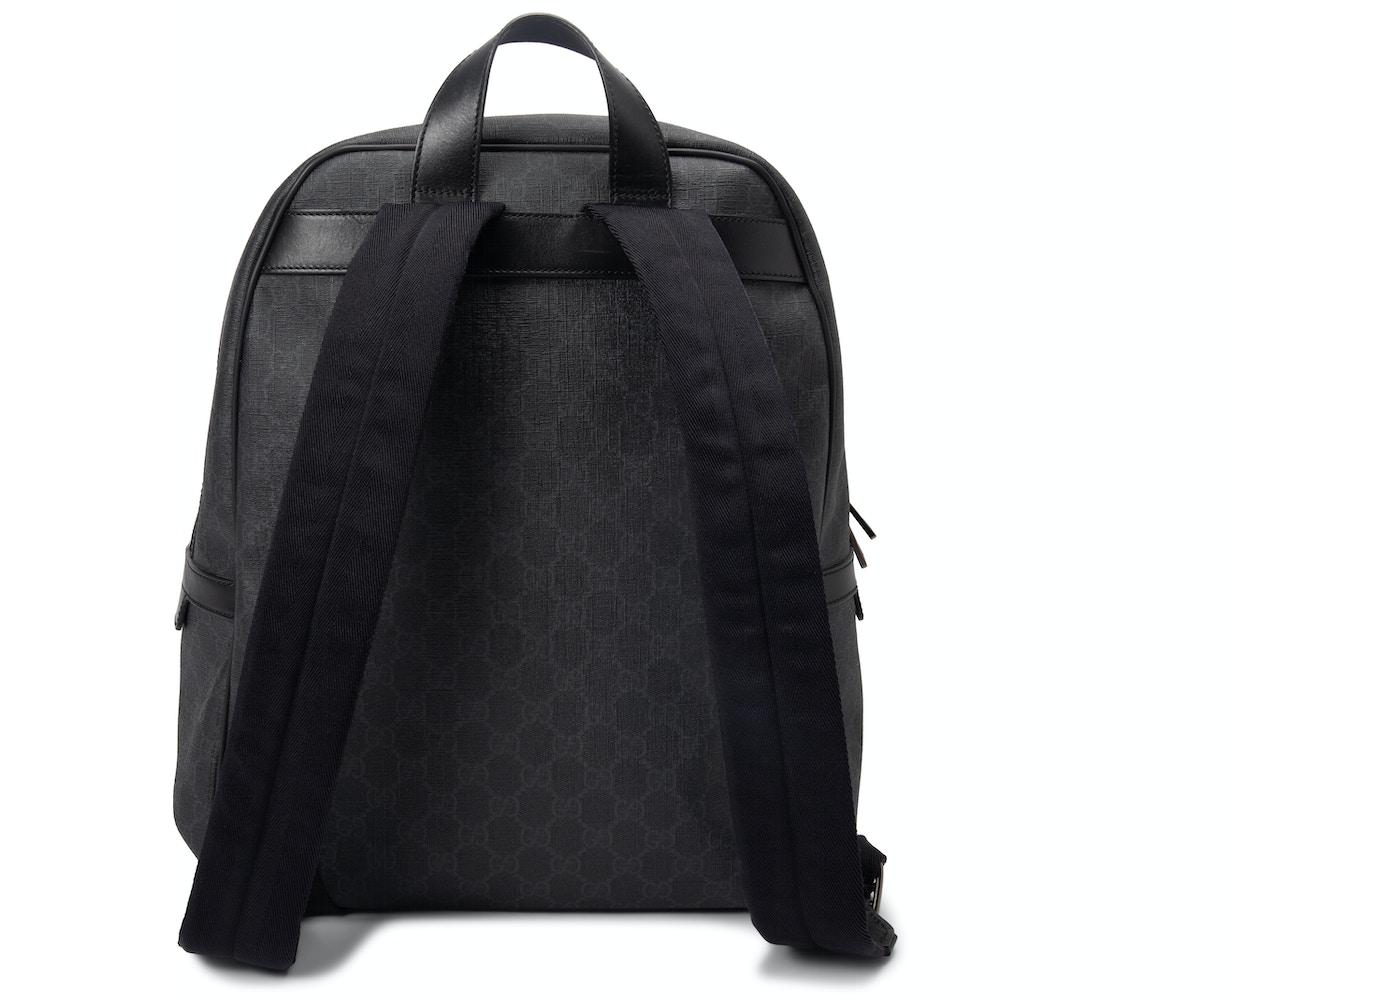 cf54ce4d08e Gucci GG Supreme Backpack Monogram GG Medium Black